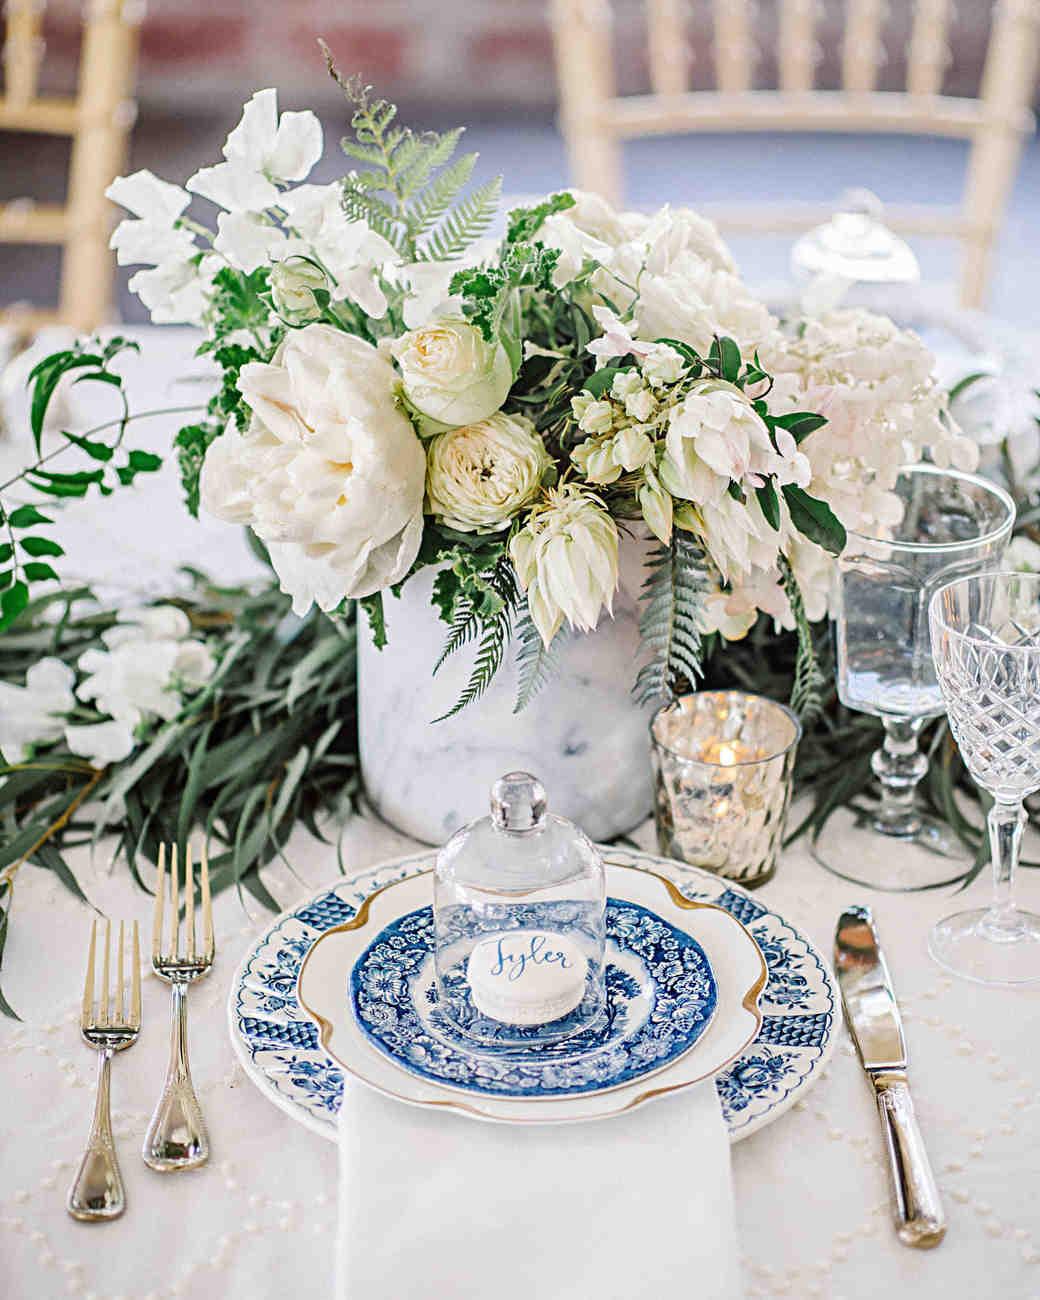 cobalt blue vase centerpieces of 79 white wedding centerpieces martha stewart weddings regarding hannah steve wedding california china macarons